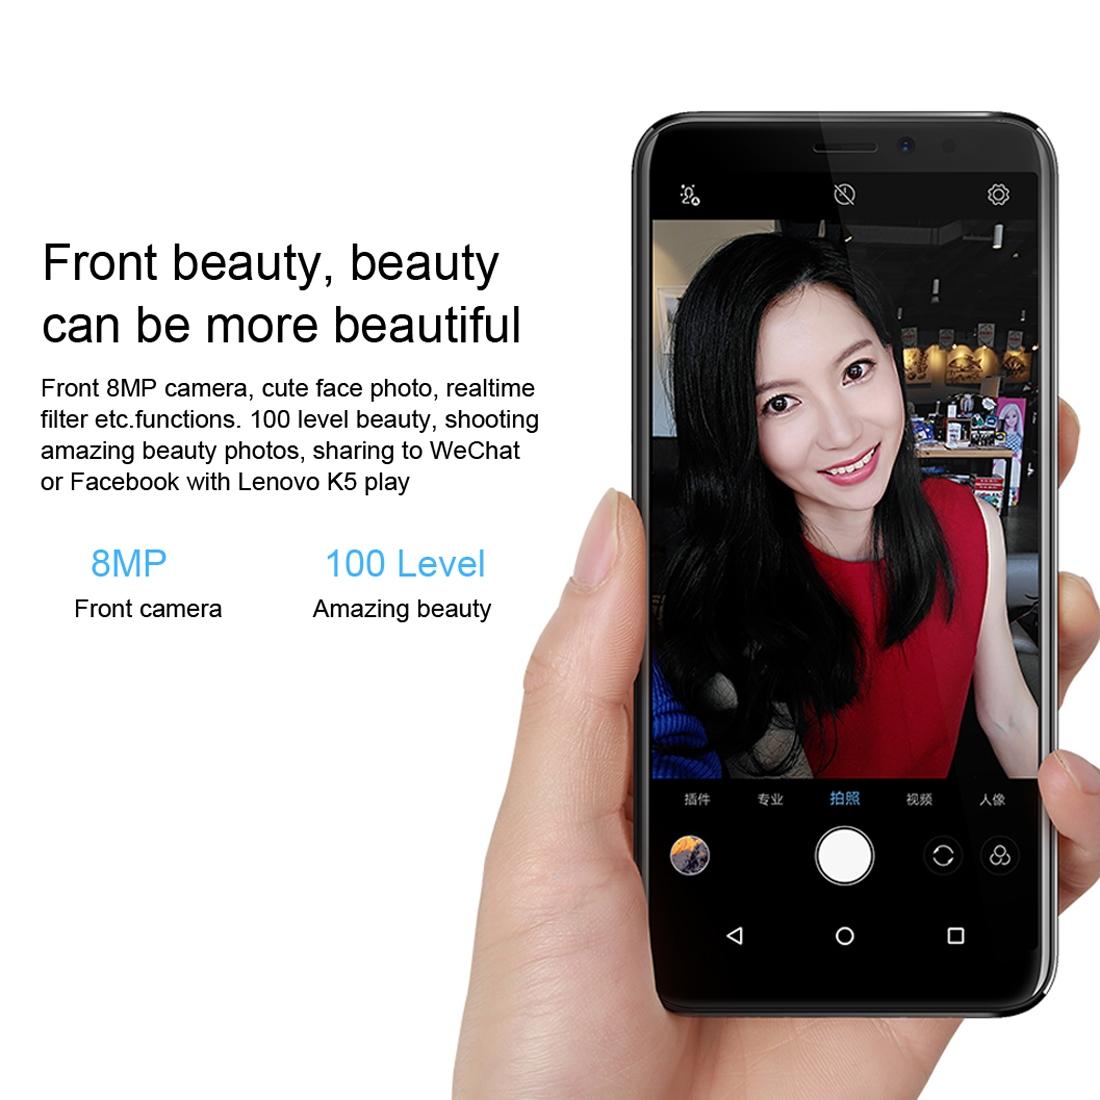 i.ibb.co/GRjbdbt/Smartphone-3-GB-32-GB-Jogo-Lenovo-K5-Play-Azul-6.jpg